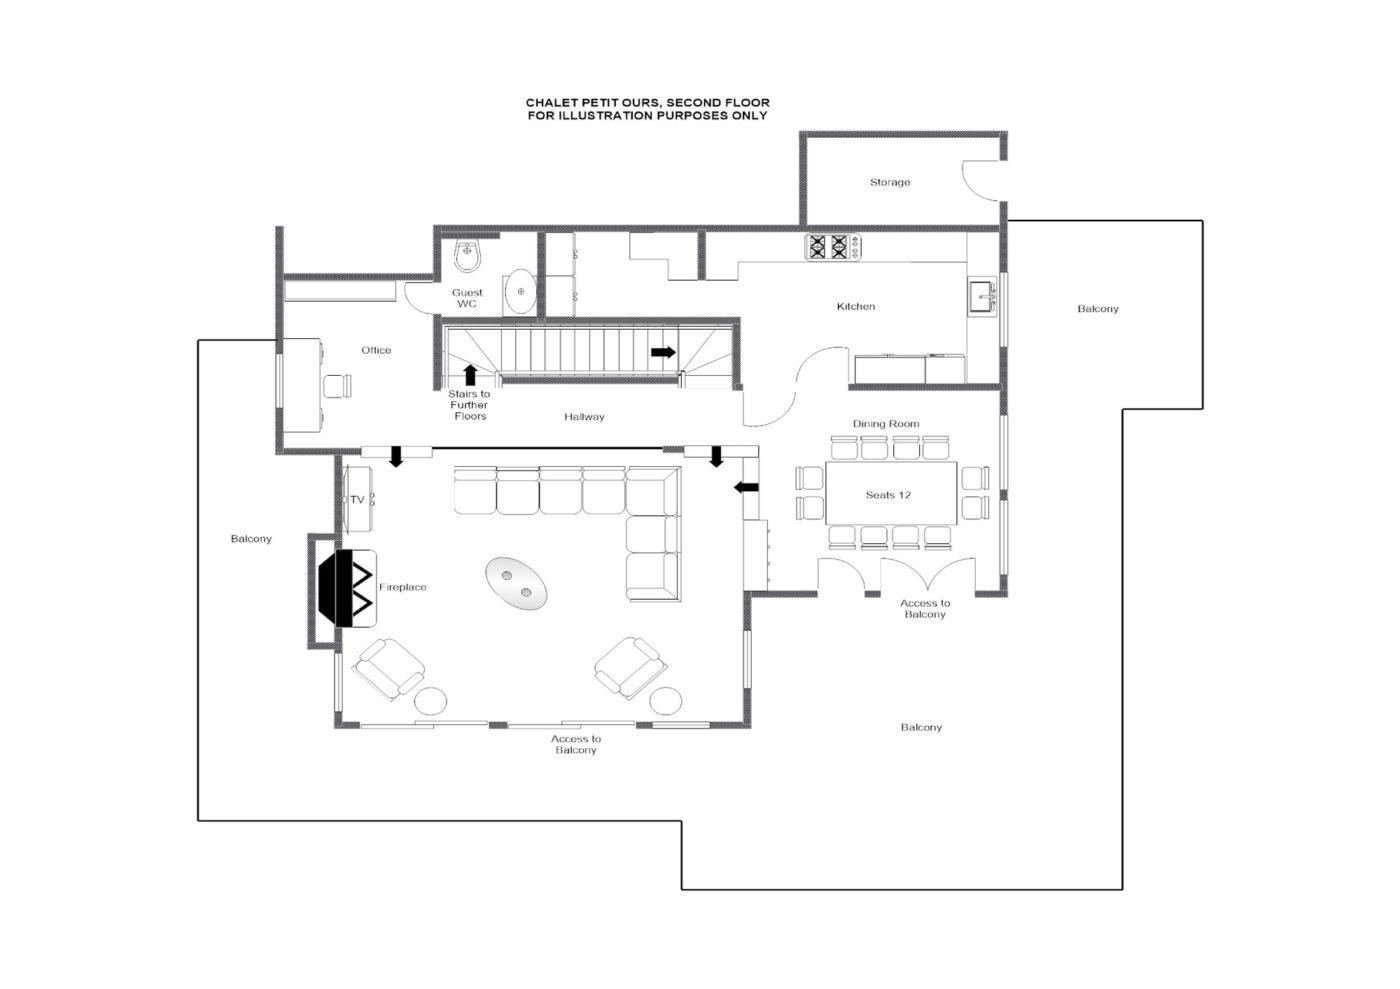 Chalet Petit Ours Verbier Floor Plan 2